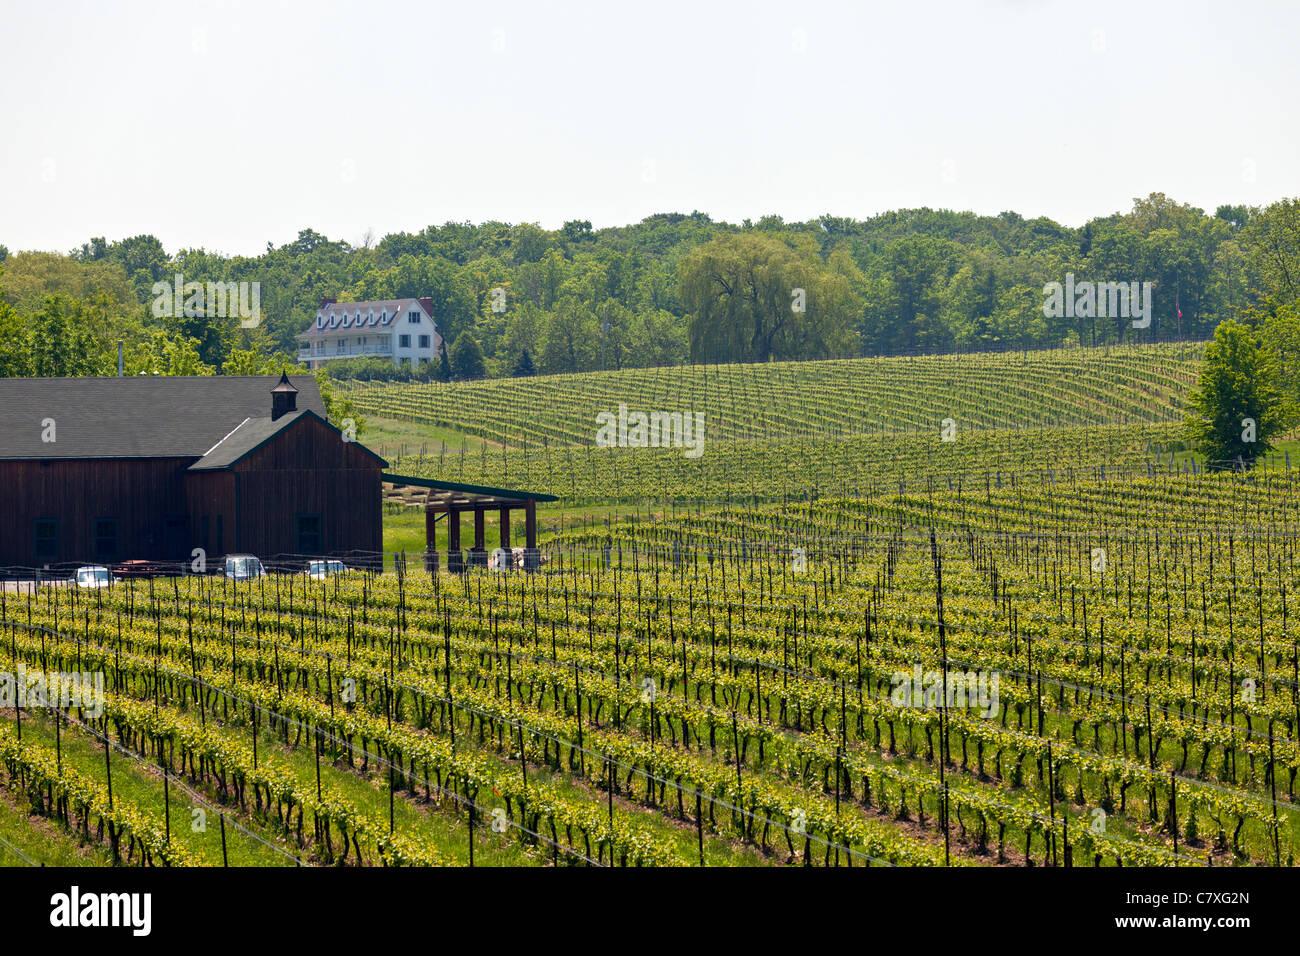 Kanada, Ontario, Weinberge in der Niagara-Region Stockbild